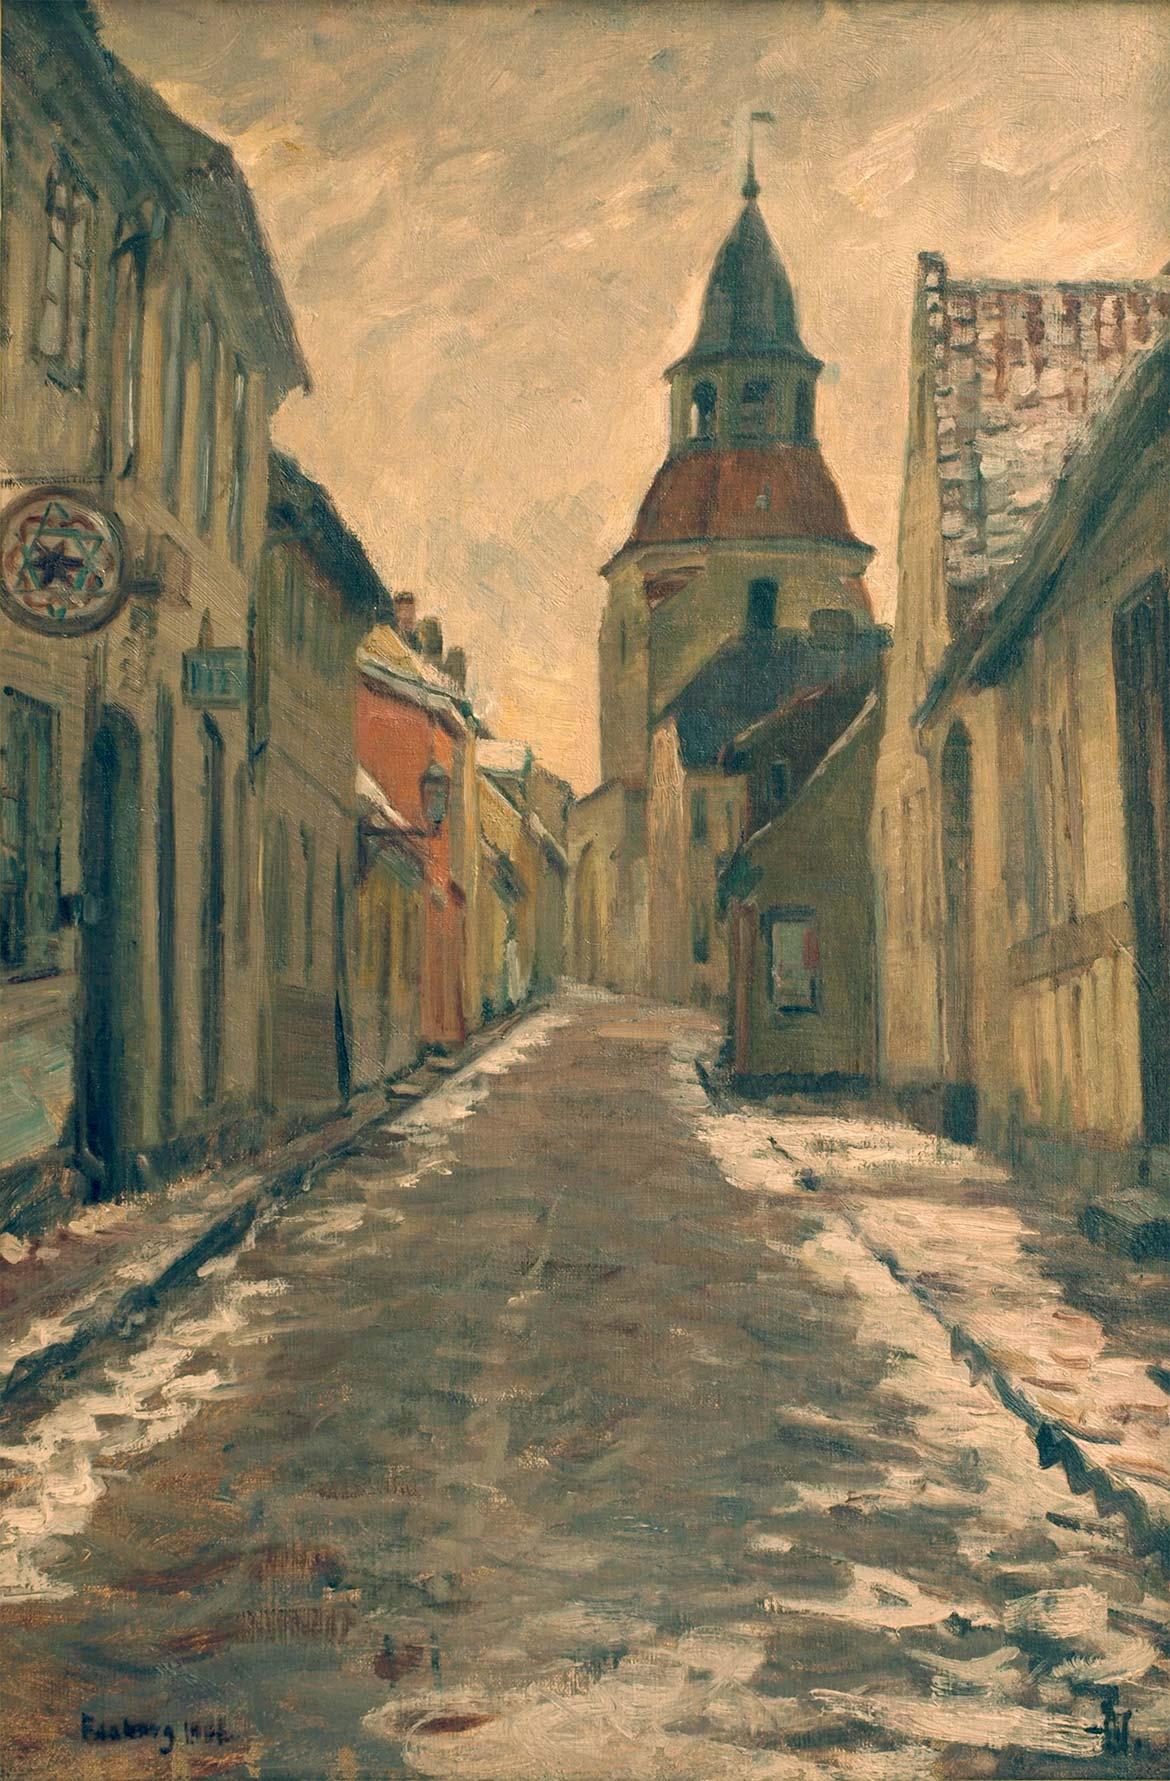 Albert Gottschalk, Gadeparti med Klokketårnet i Faaborg, 1901. Faaborg Museum.